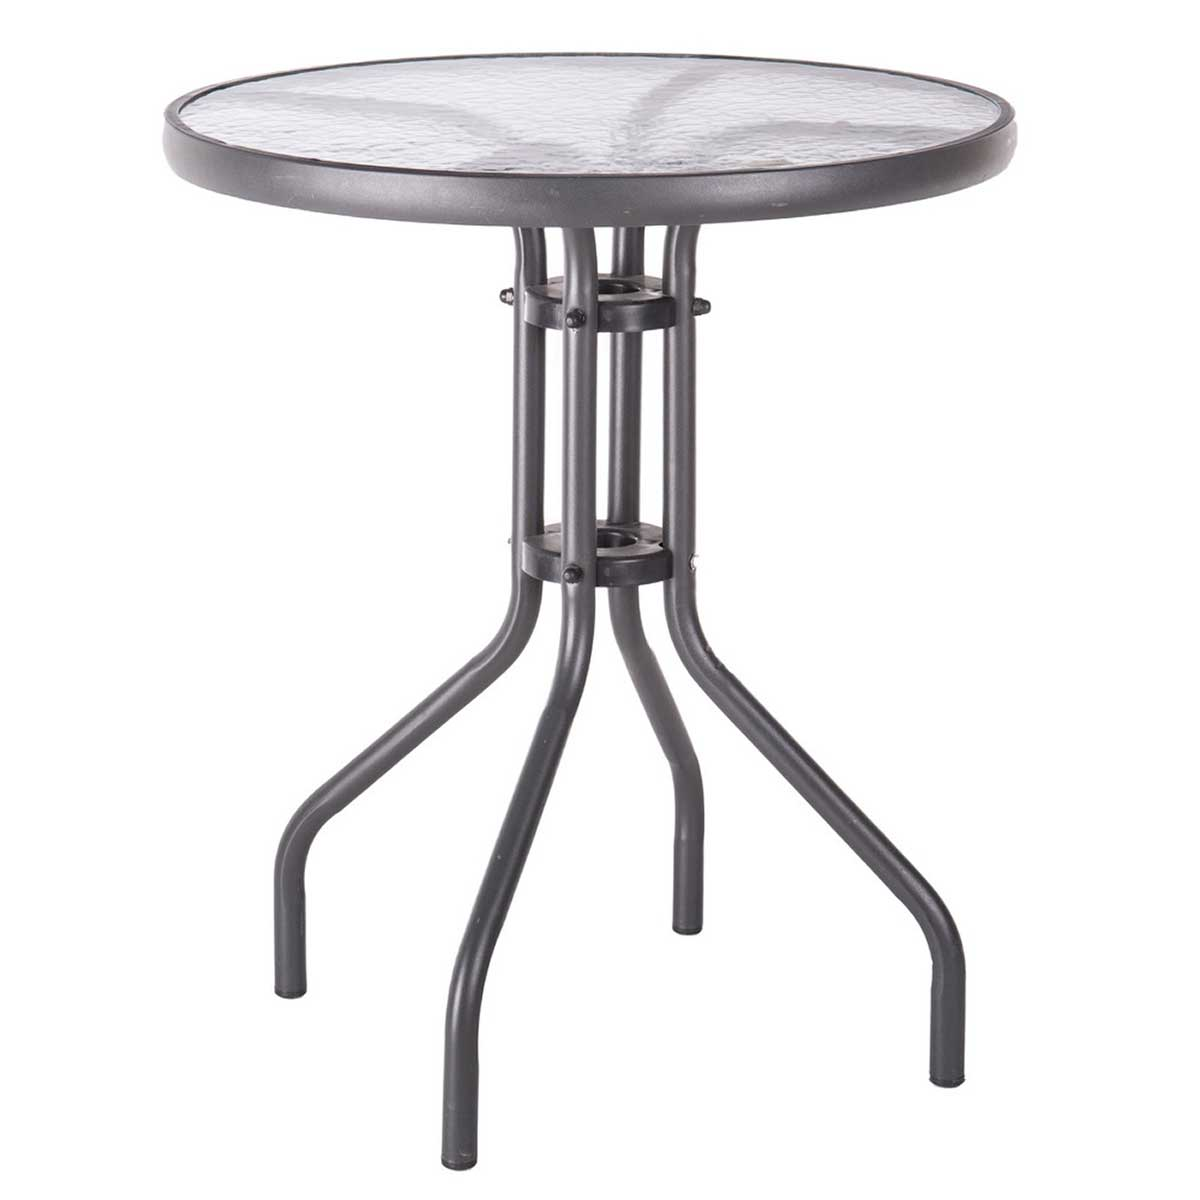 Table de balcon style bistrot - Anthracite - 60.00 cm x 60.00 cm x 71.00 cm